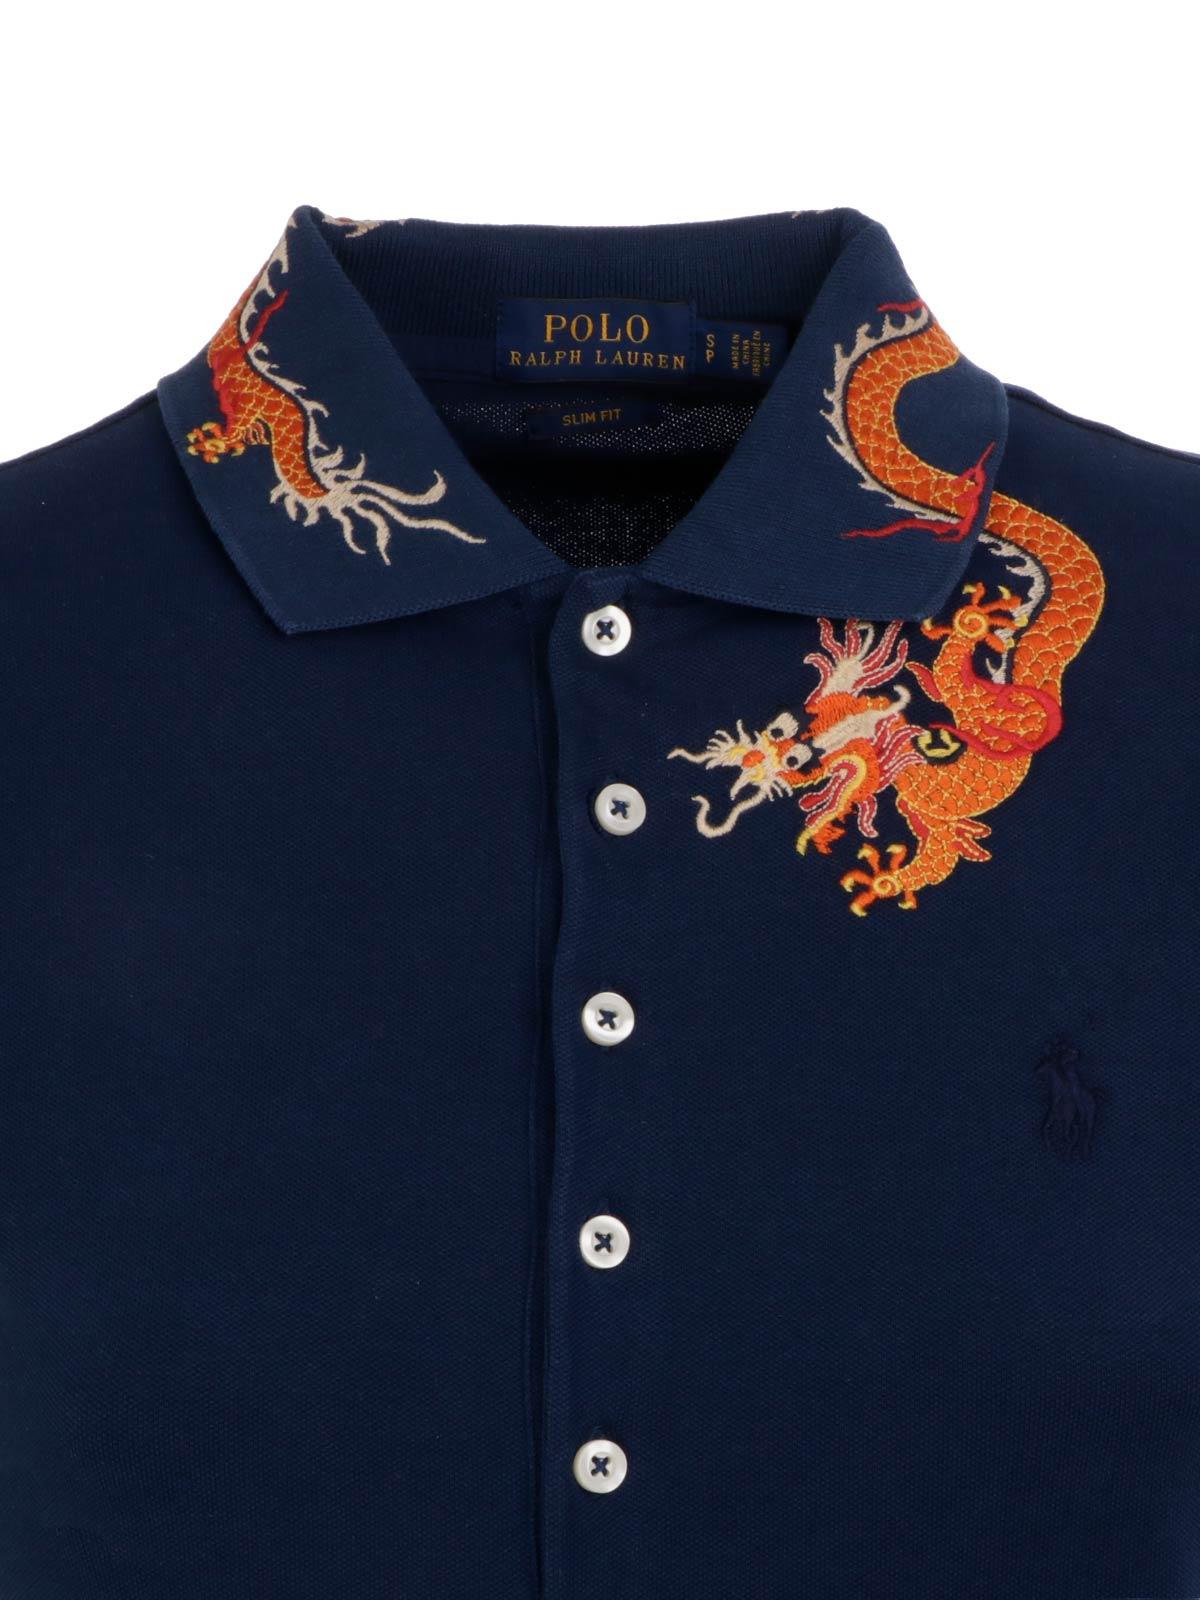 Womens Polo Polo Womens Polo Personalized Personalized Shirts Personalized Shirts Womens 8NOXwnPk0